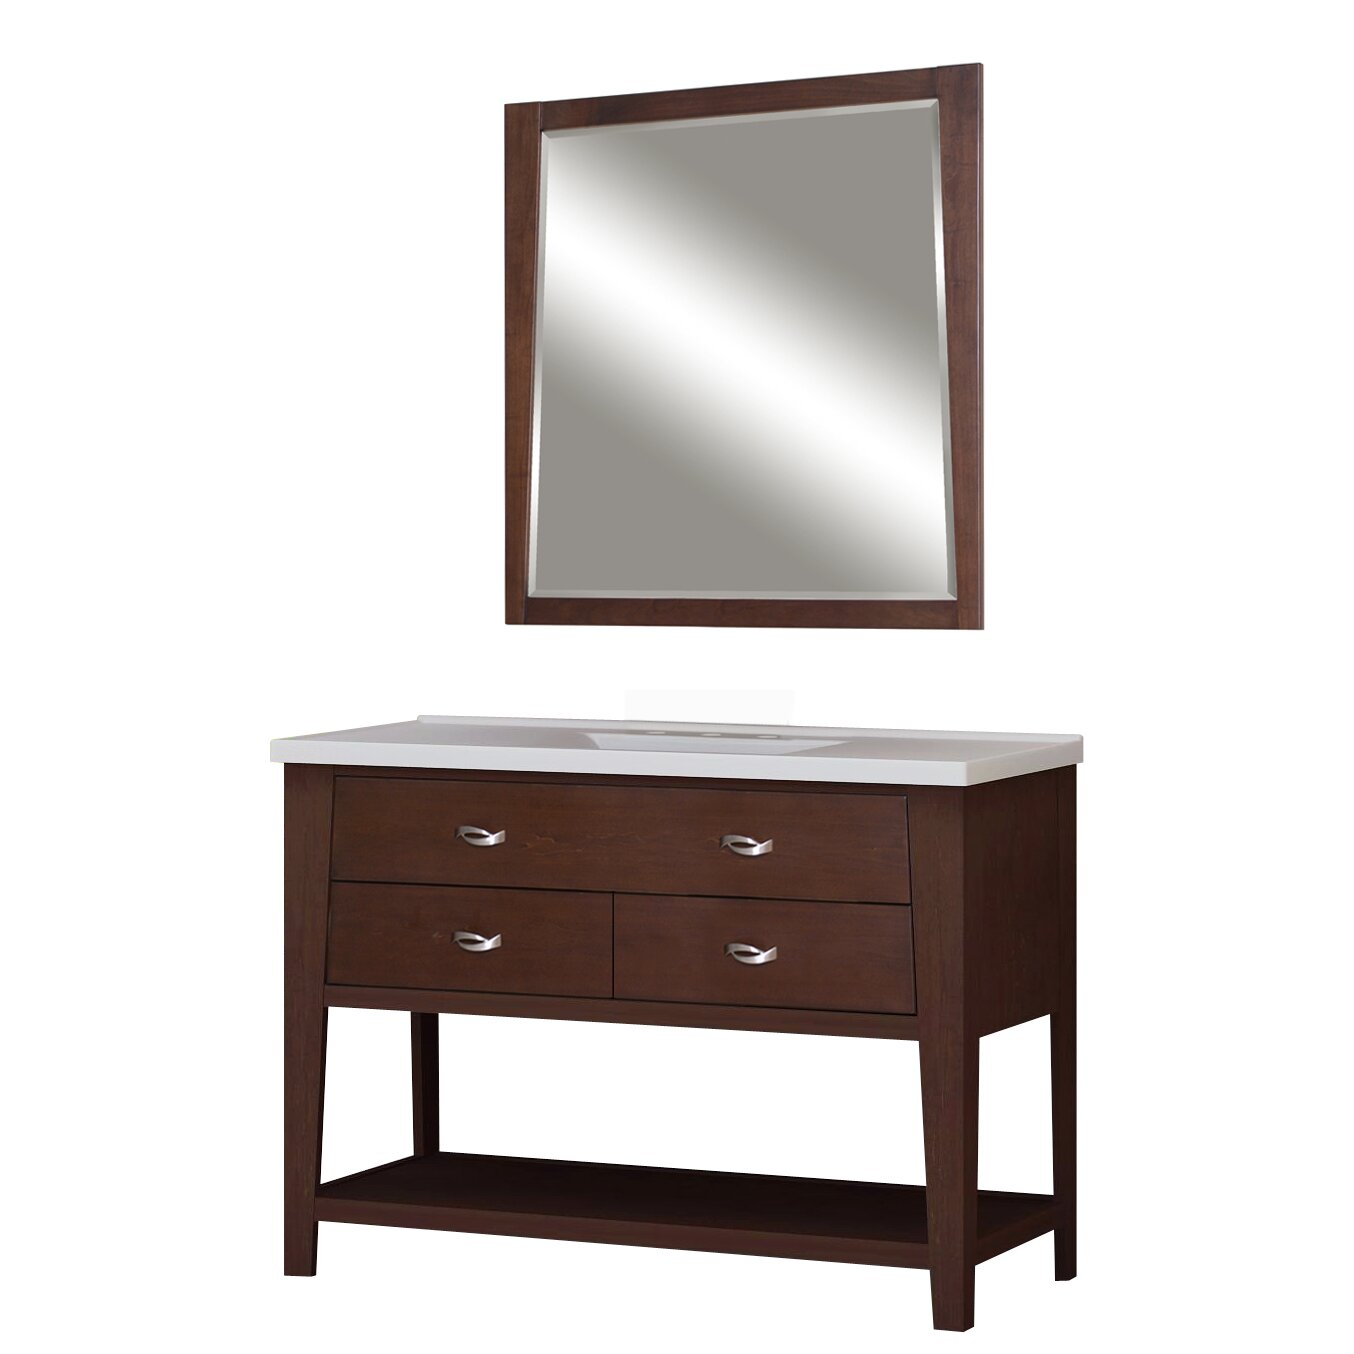 sunny wood premier tops 49 bathroom vanity top with. Black Bedroom Furniture Sets. Home Design Ideas